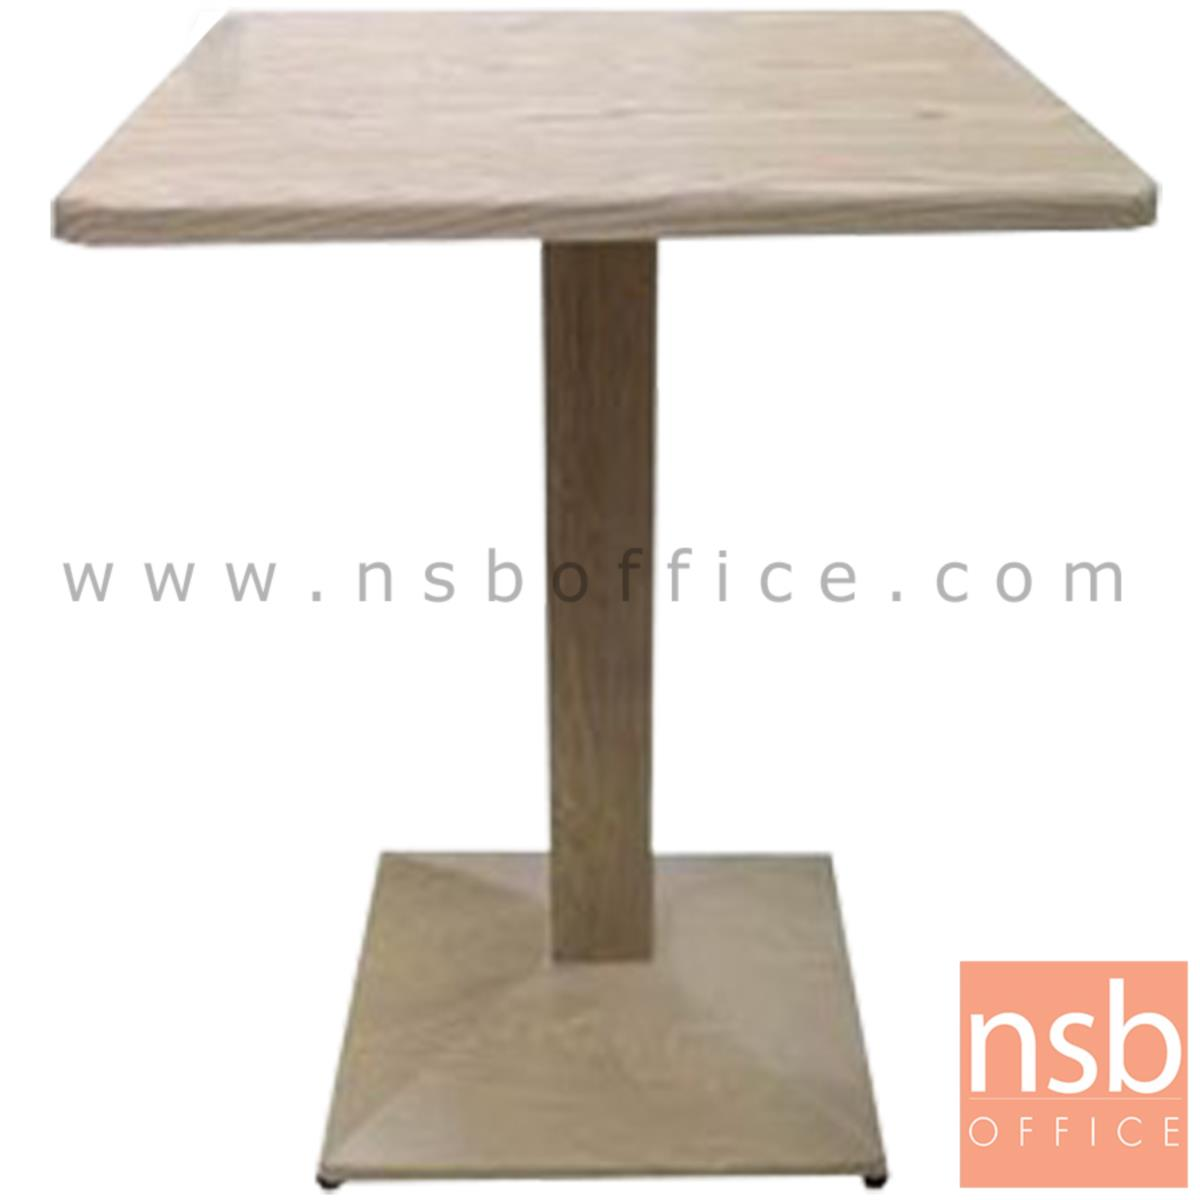 A14A233:โต๊ะเหลี่ยมหน้าไม้ รุ่น ZERMATT (เซอร์แมท) ขนาด 60W cm. ขาเหล็ก